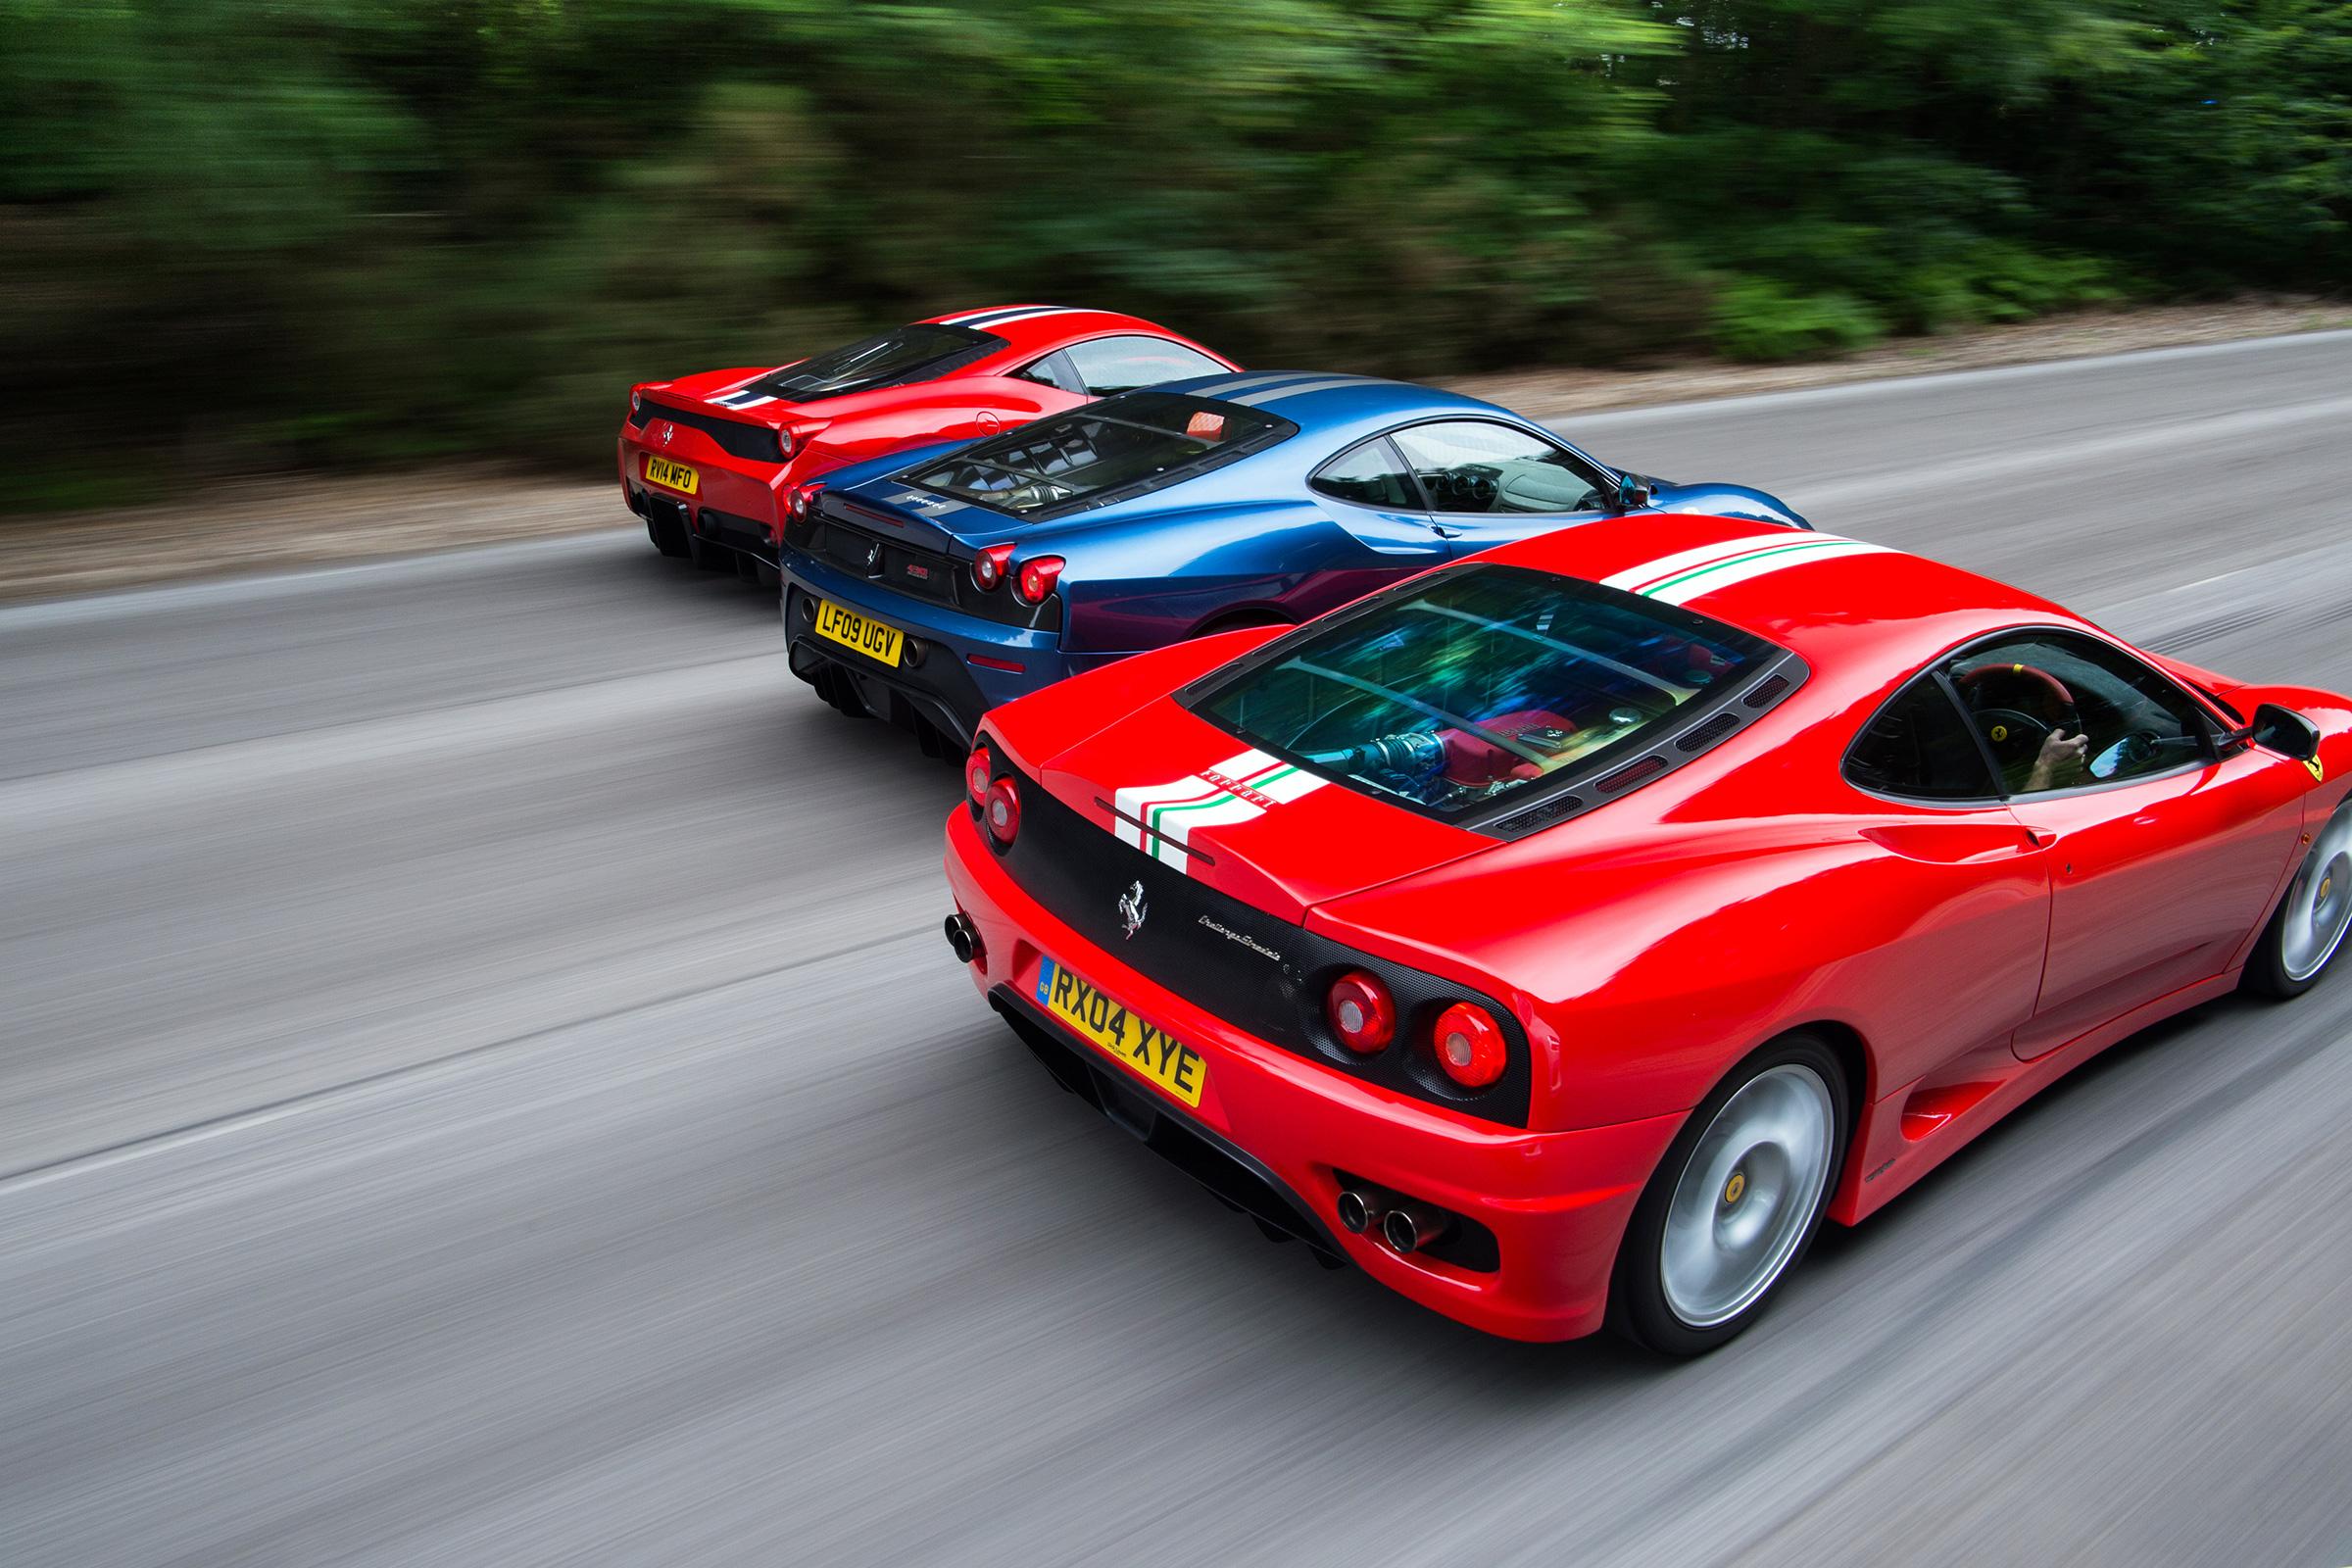 Ferrari Lightweight Specials 458 Speciale Vs 430 Scuderia